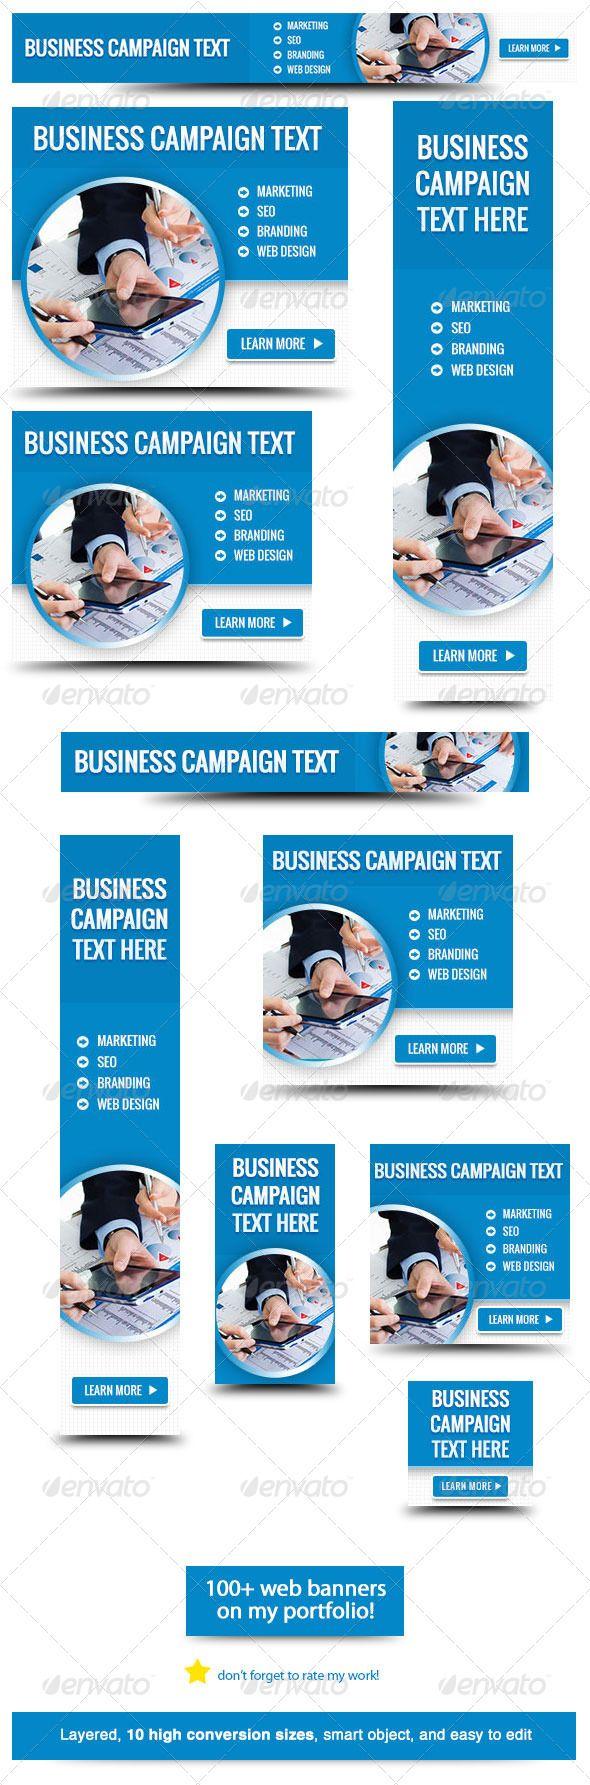 Online Banner Template Kleobeachfixco - Display ad templates